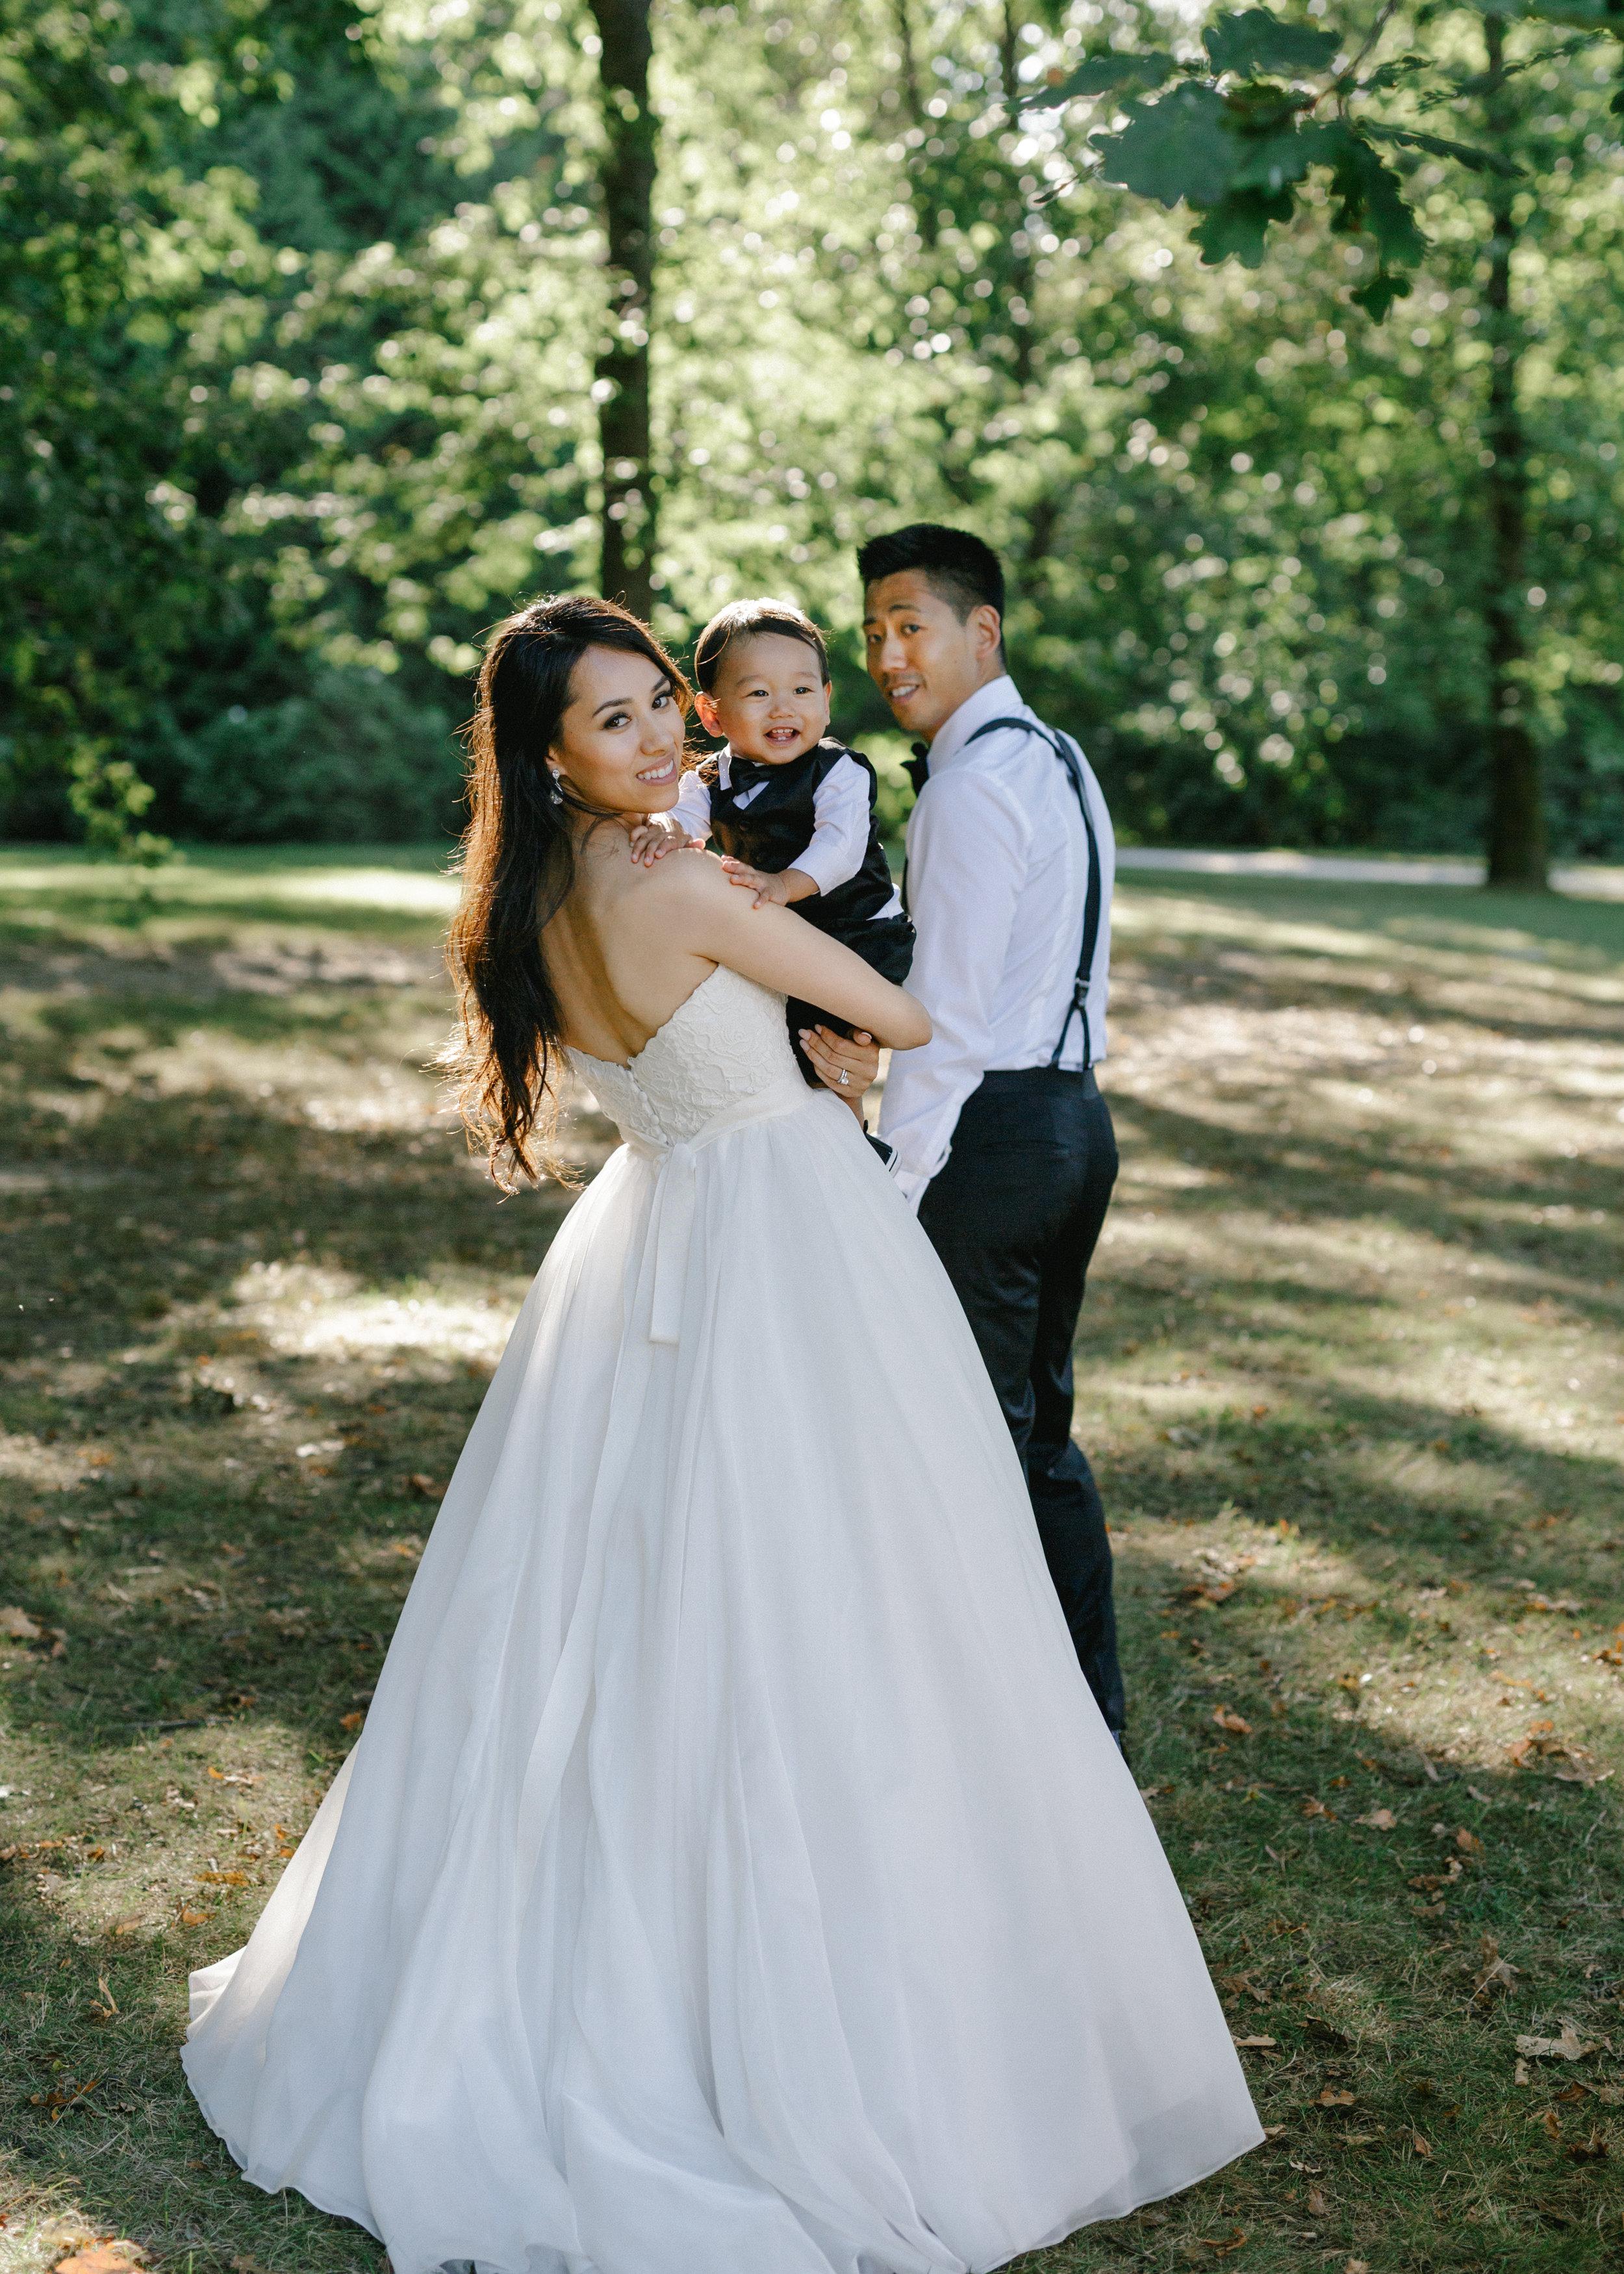 herafilms_wedding_priscilla_adrian_hera_selects-41.jpg